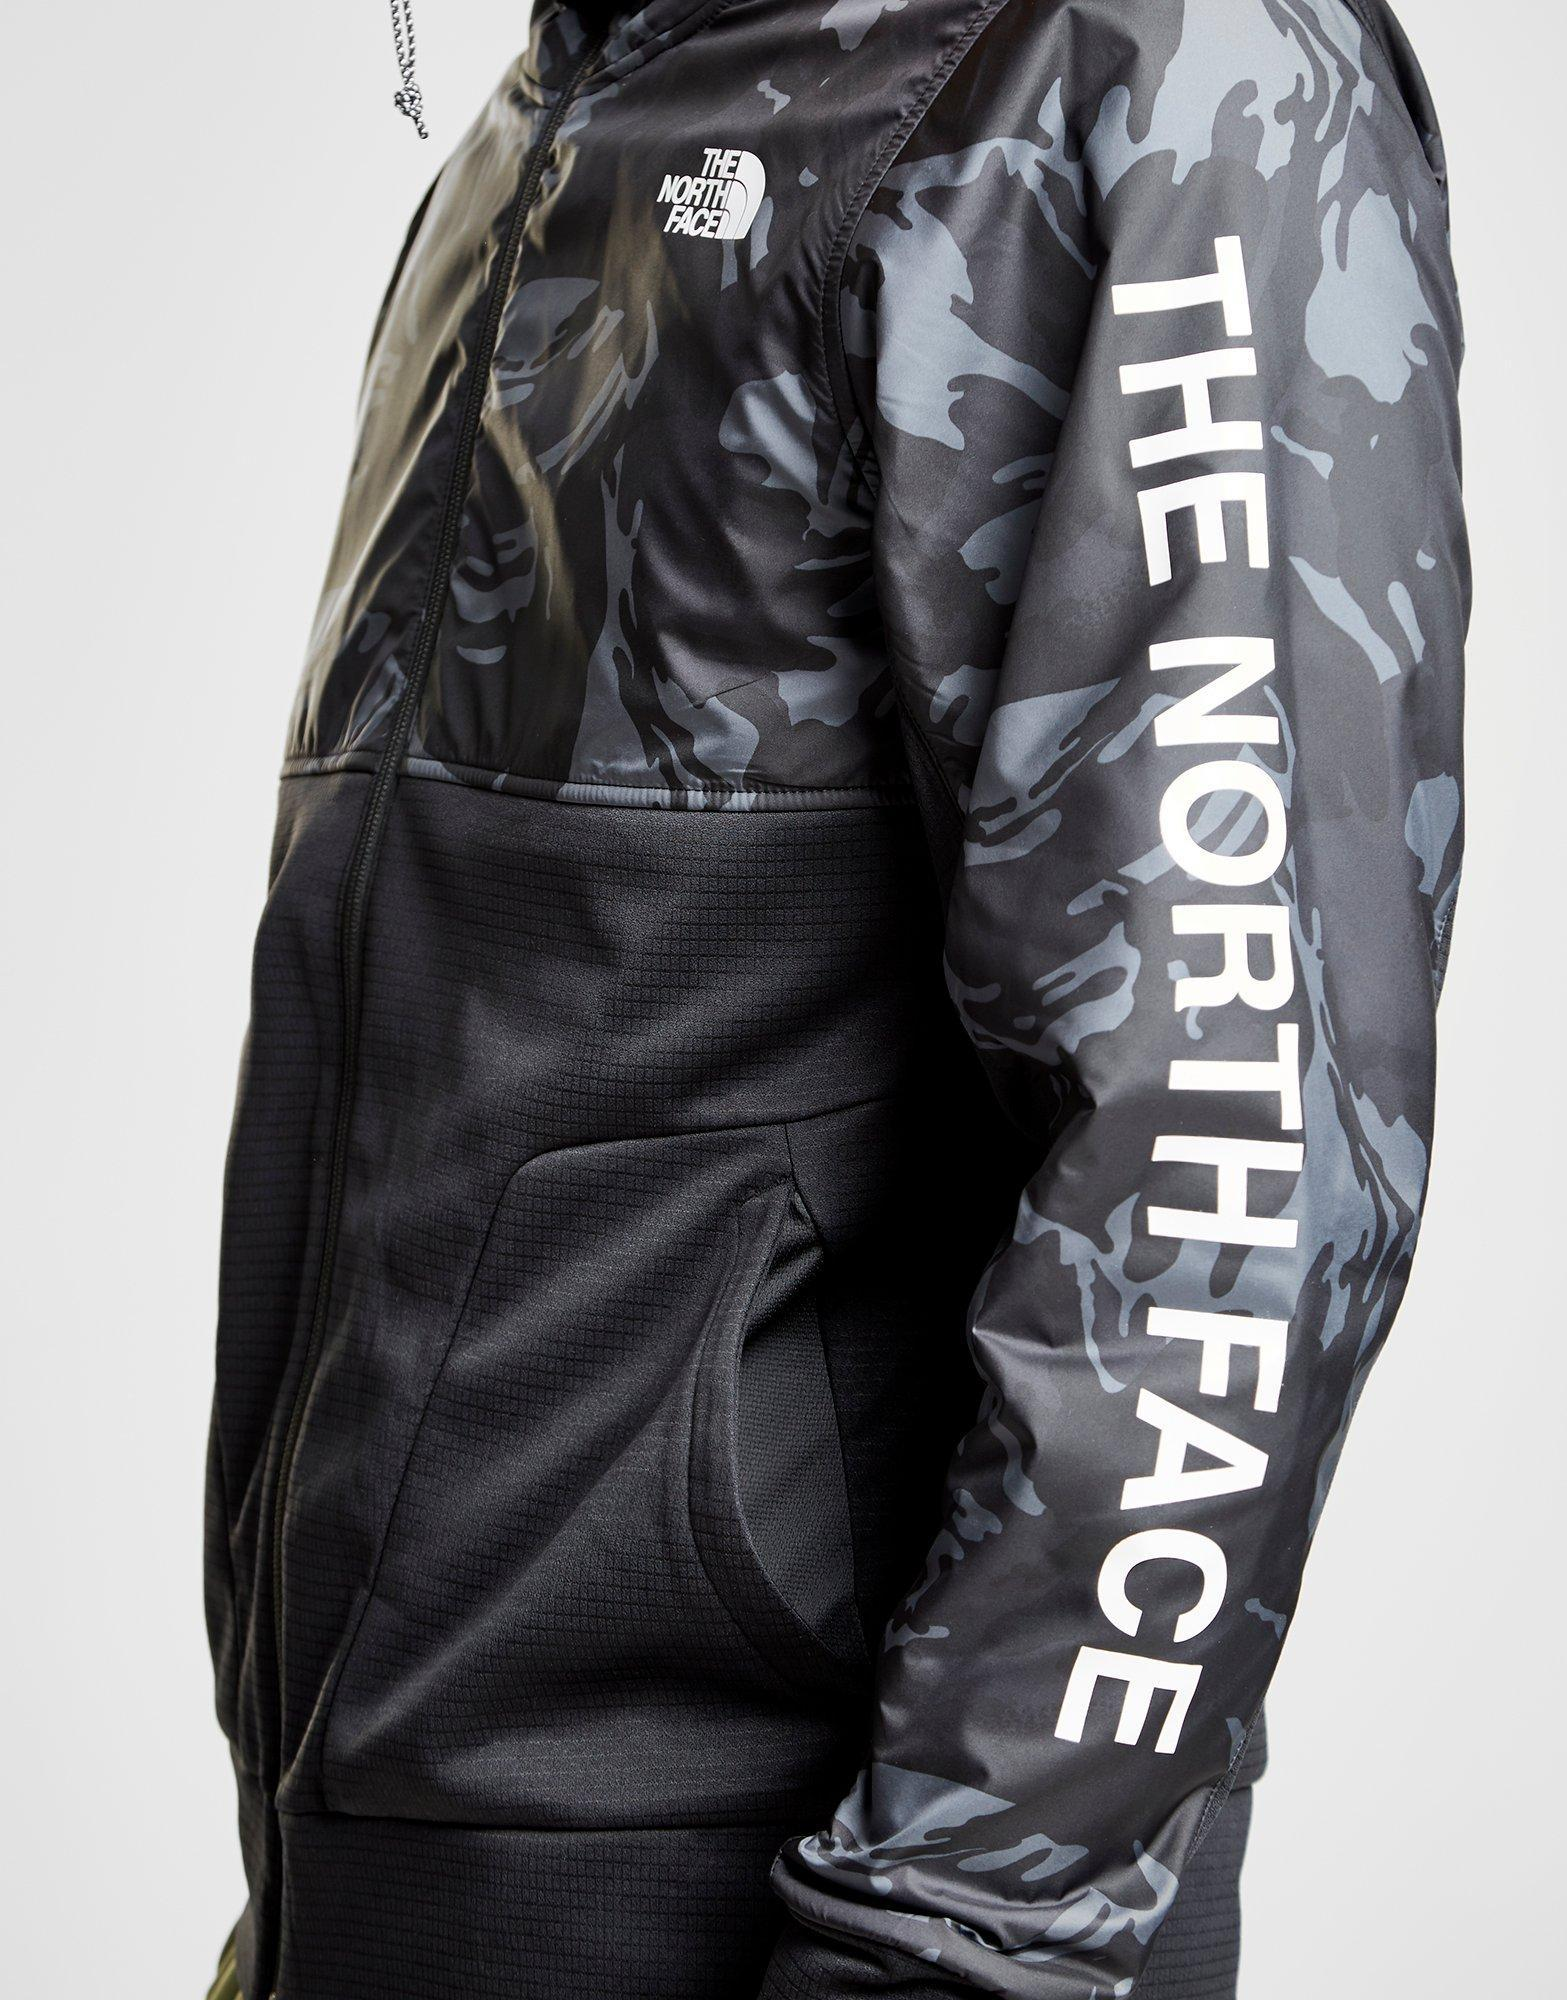 cb70c81e2 The North Face Multicolor Train N Logo Full Zip Hooded Jacket for men